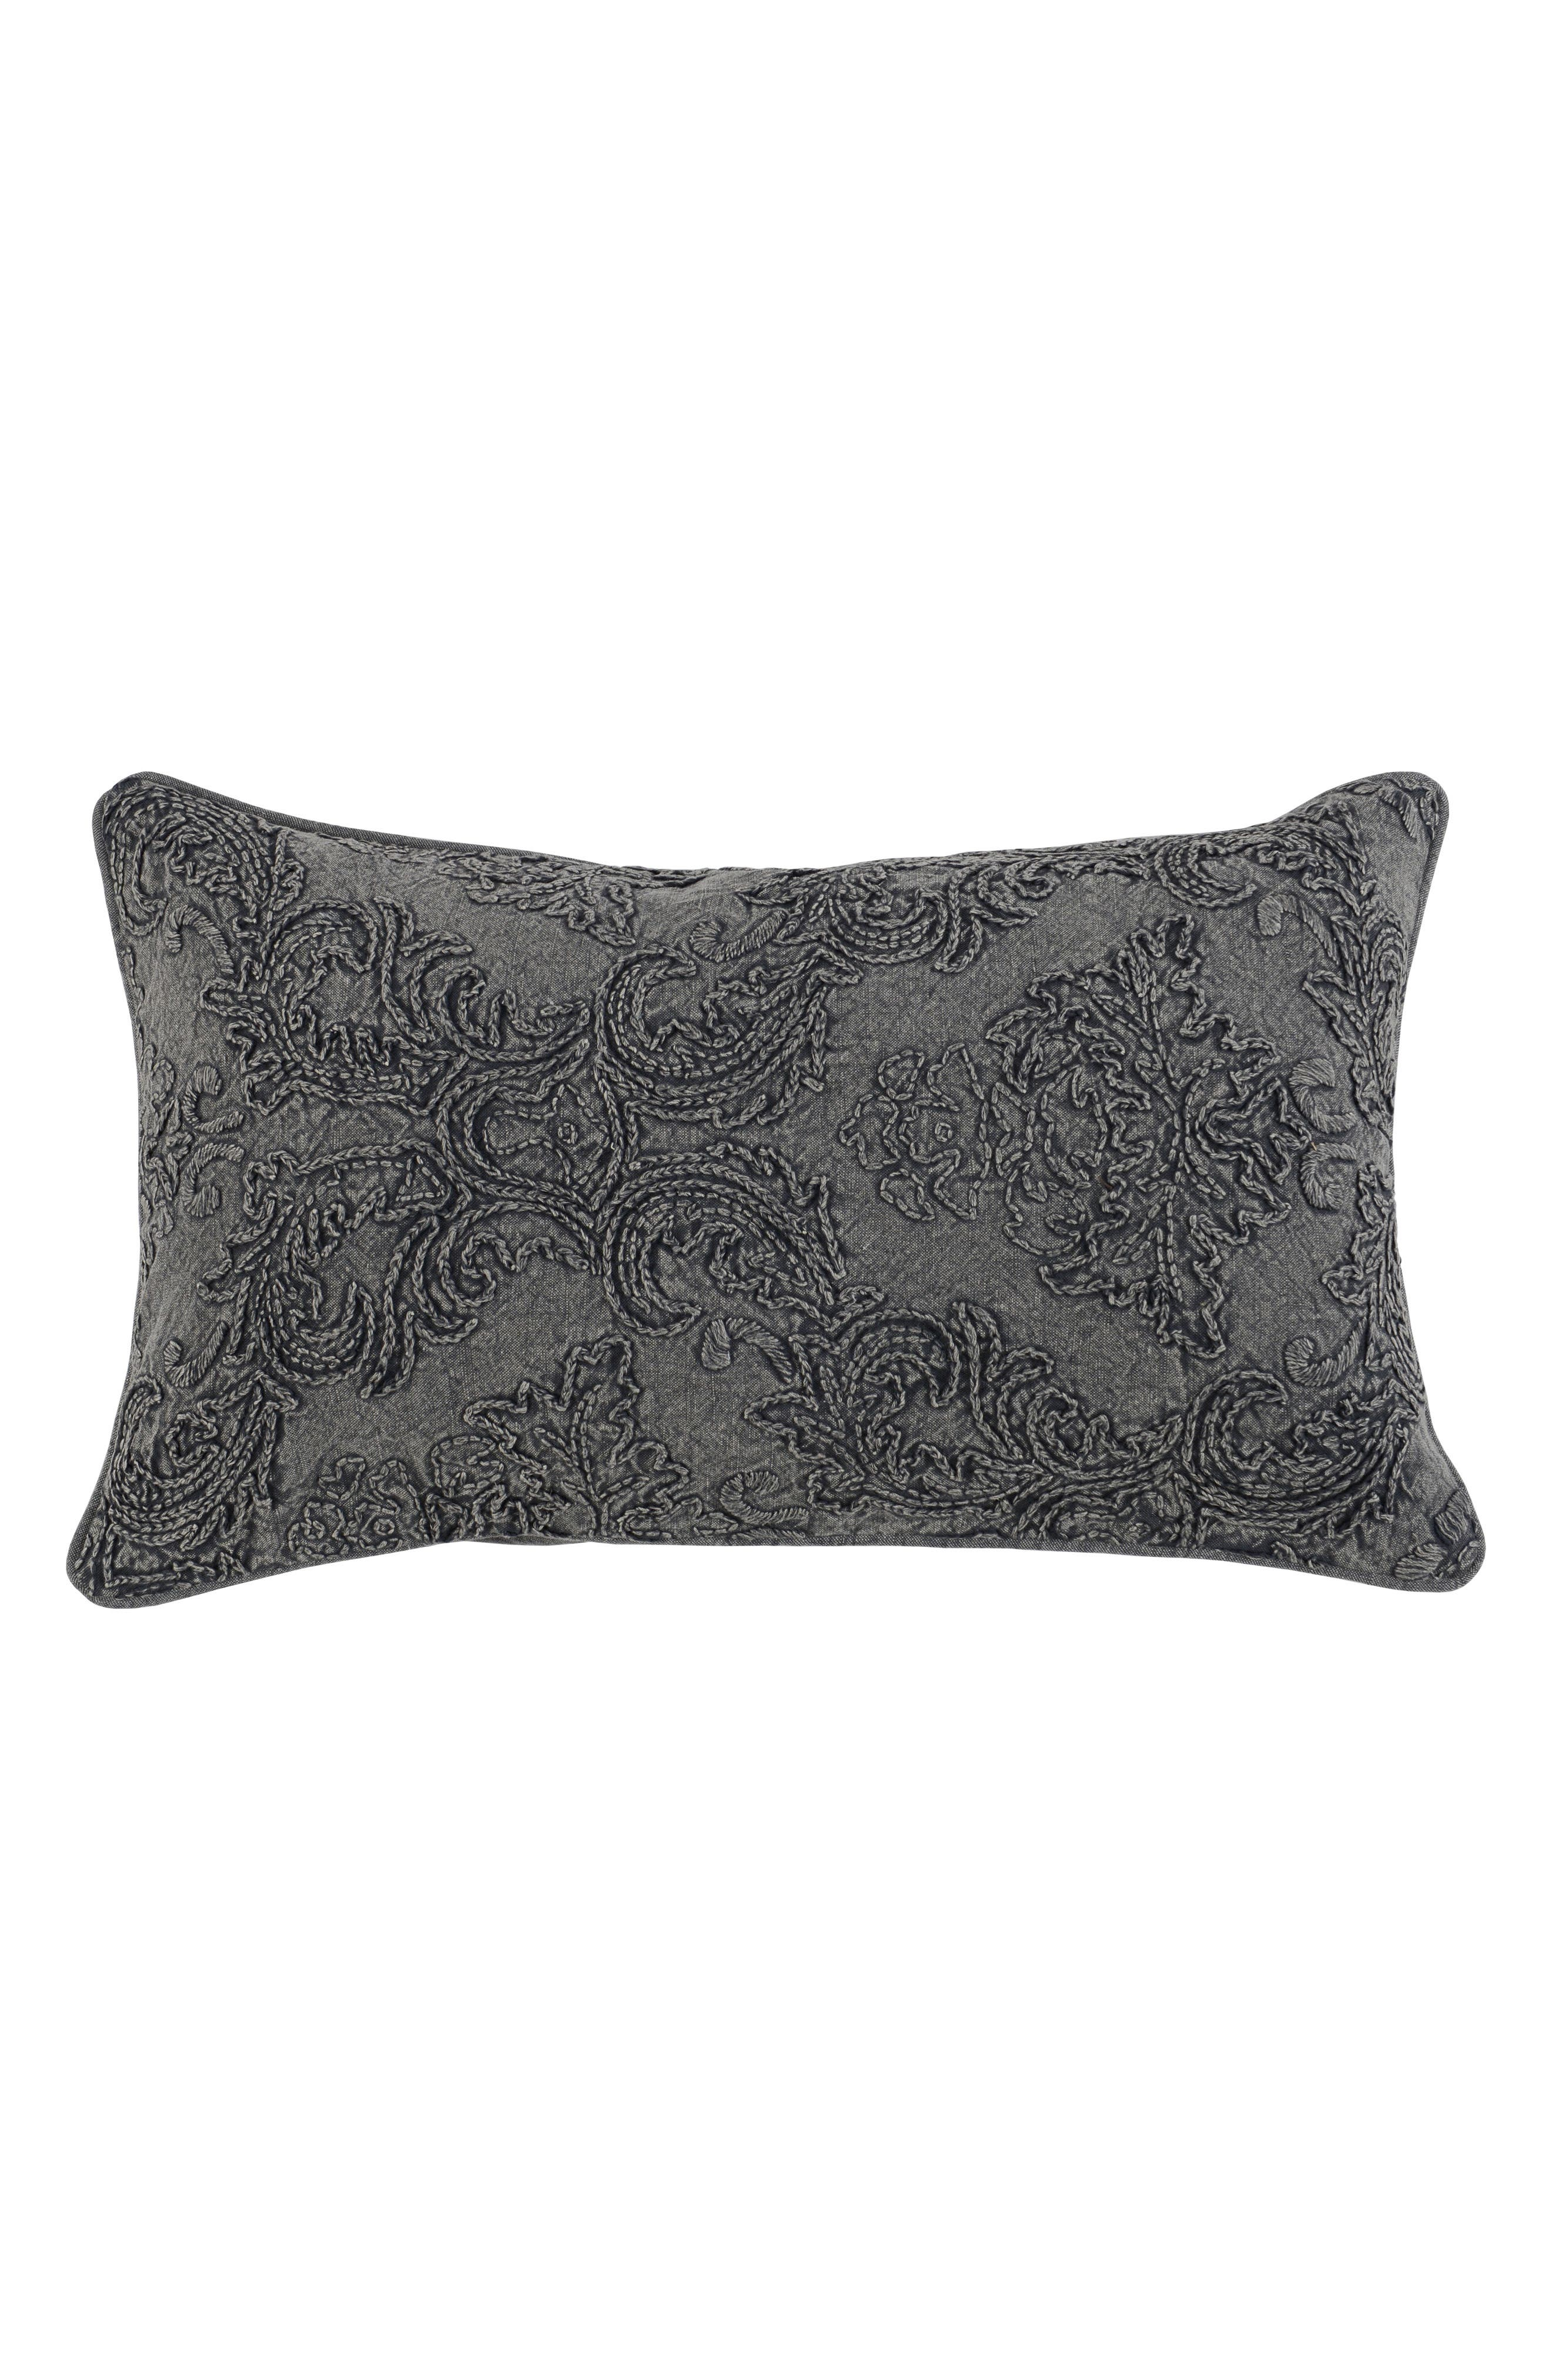 Perlita Linen Accent Pillow,                             Main thumbnail 1, color,                             CHARCOAL